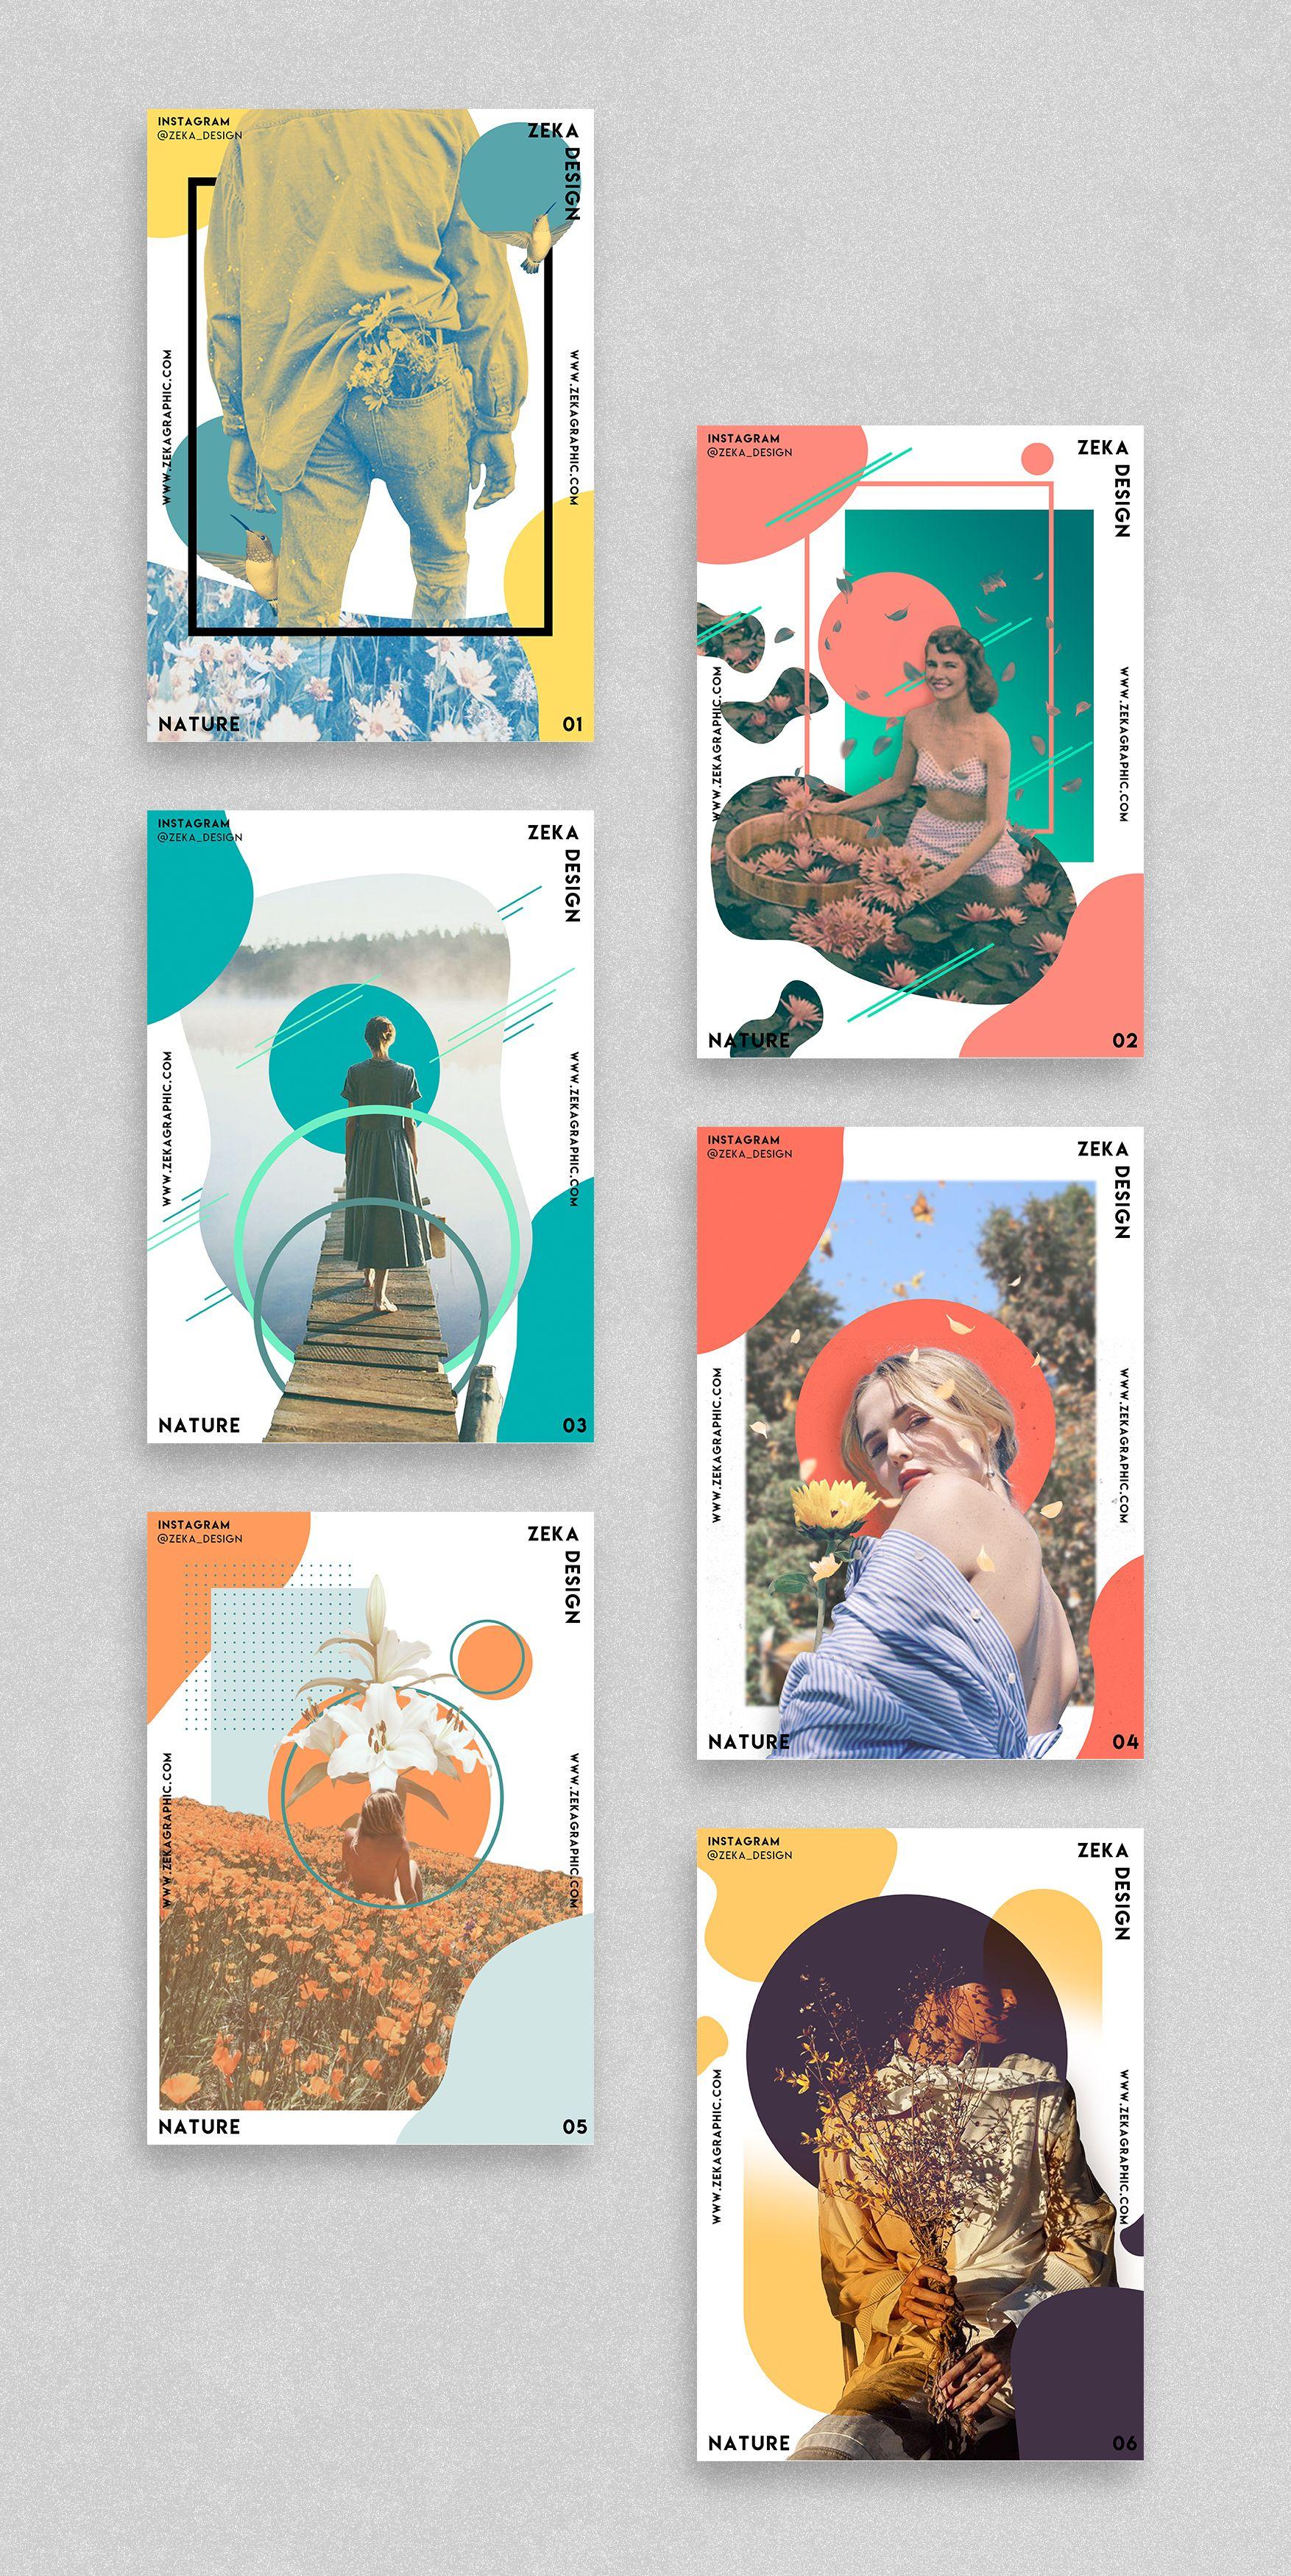 Nature Poster Design Project Graphic Design Inspiration by Zeka Design